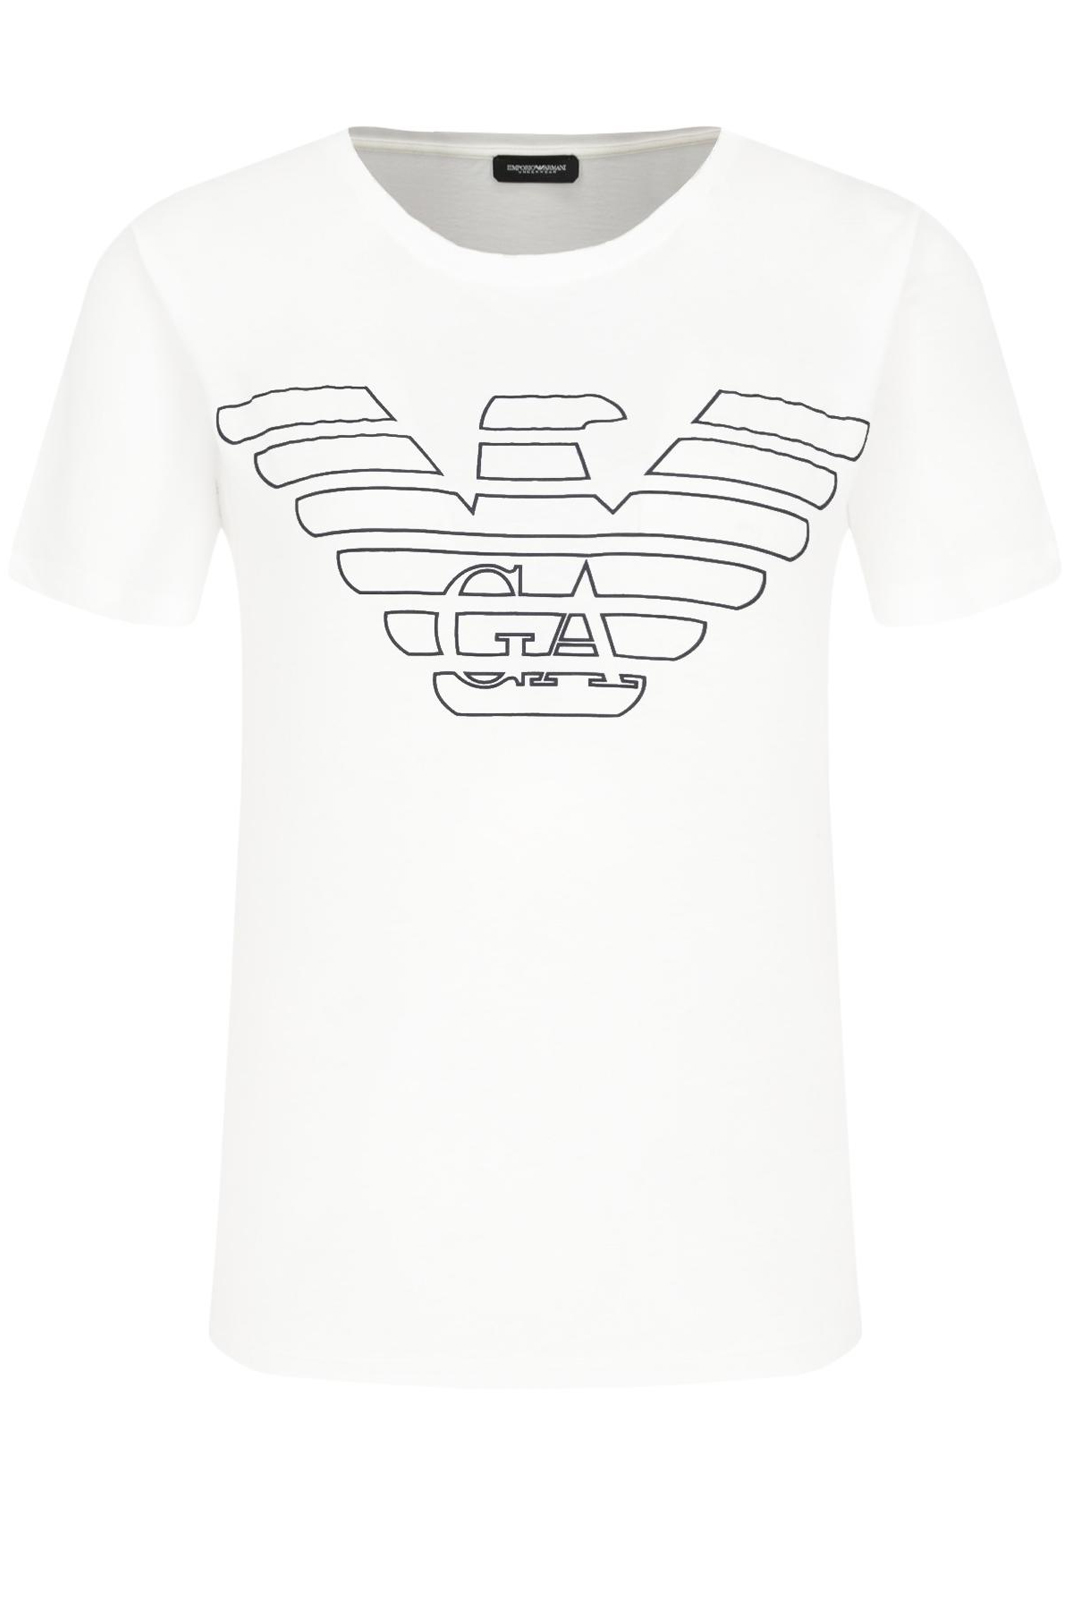 Tee shirt  Emporio armani 164141 9A255 010 BLANC